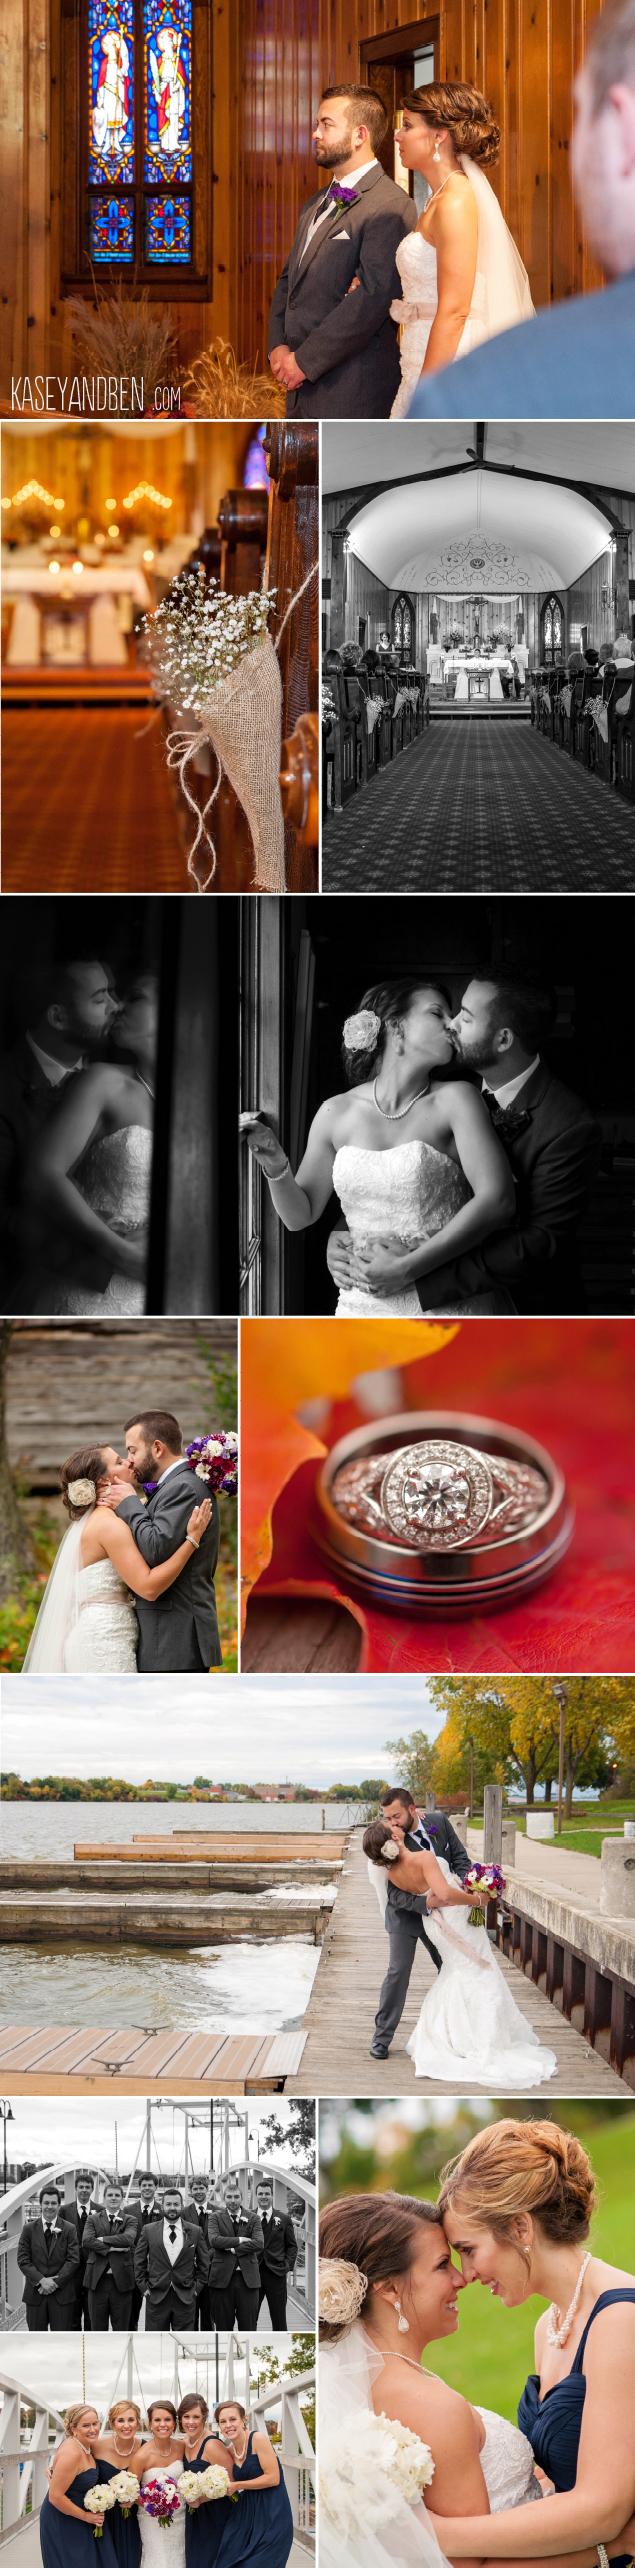 Wisconsin_Wedding_Denmark_Fall_Autumn_Voyeger_Park_Photos_2